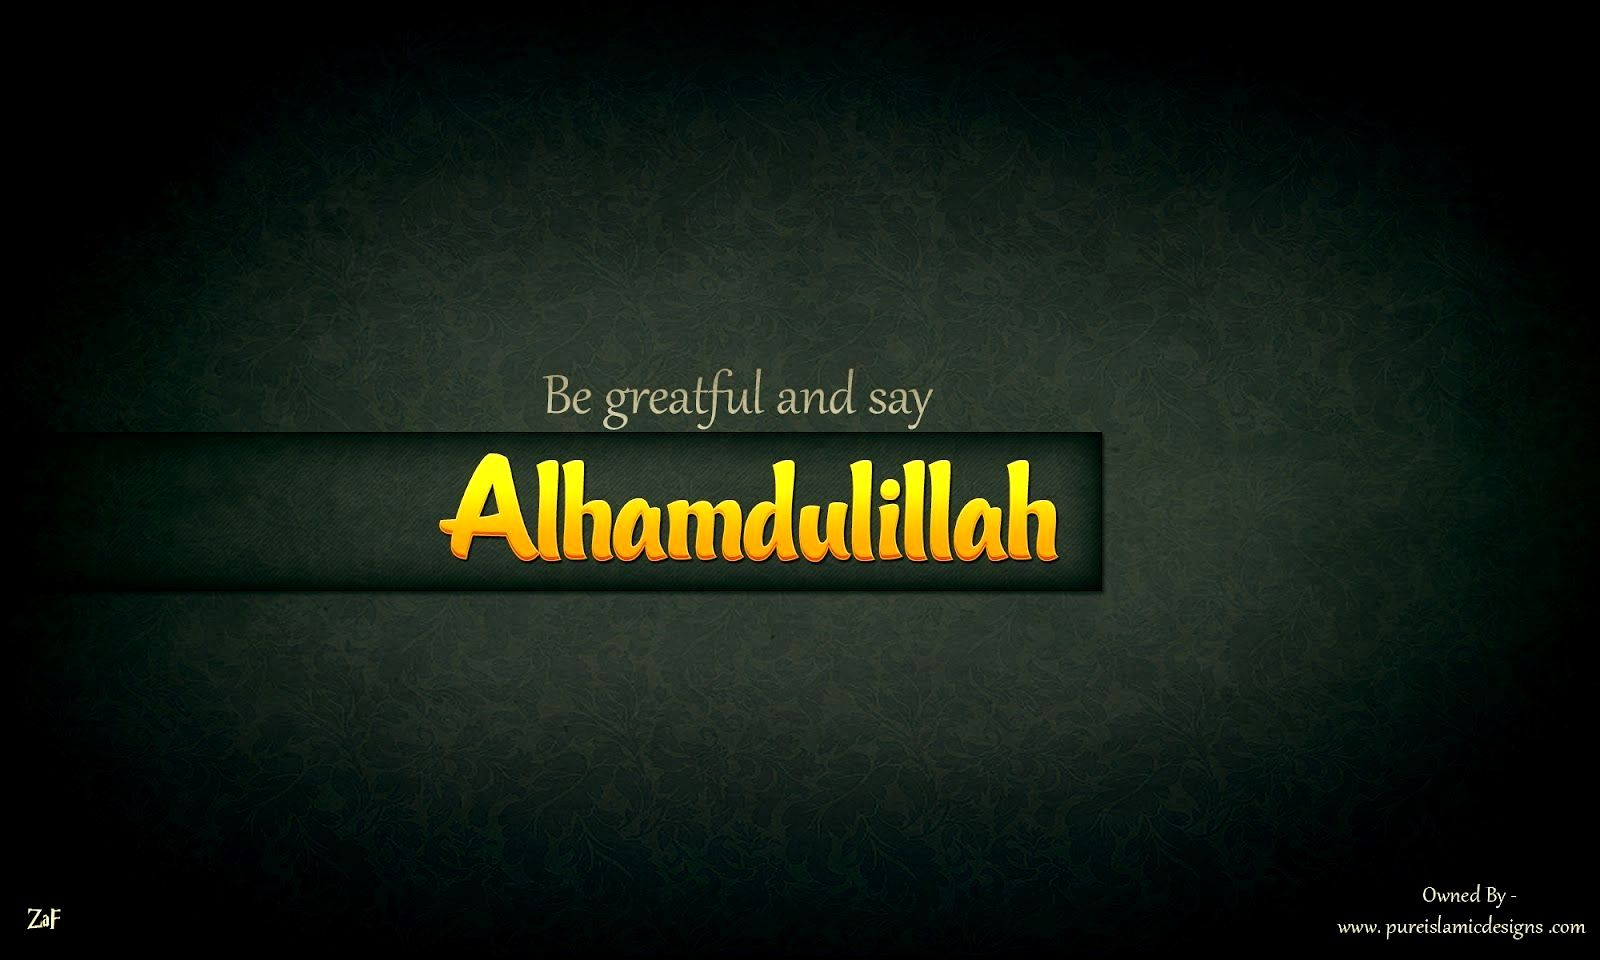 4k Wallpaper For Pc Allah Ideas Islamic Wallpaper Islamic Quotes Wallpaper Wallpaper Quotes